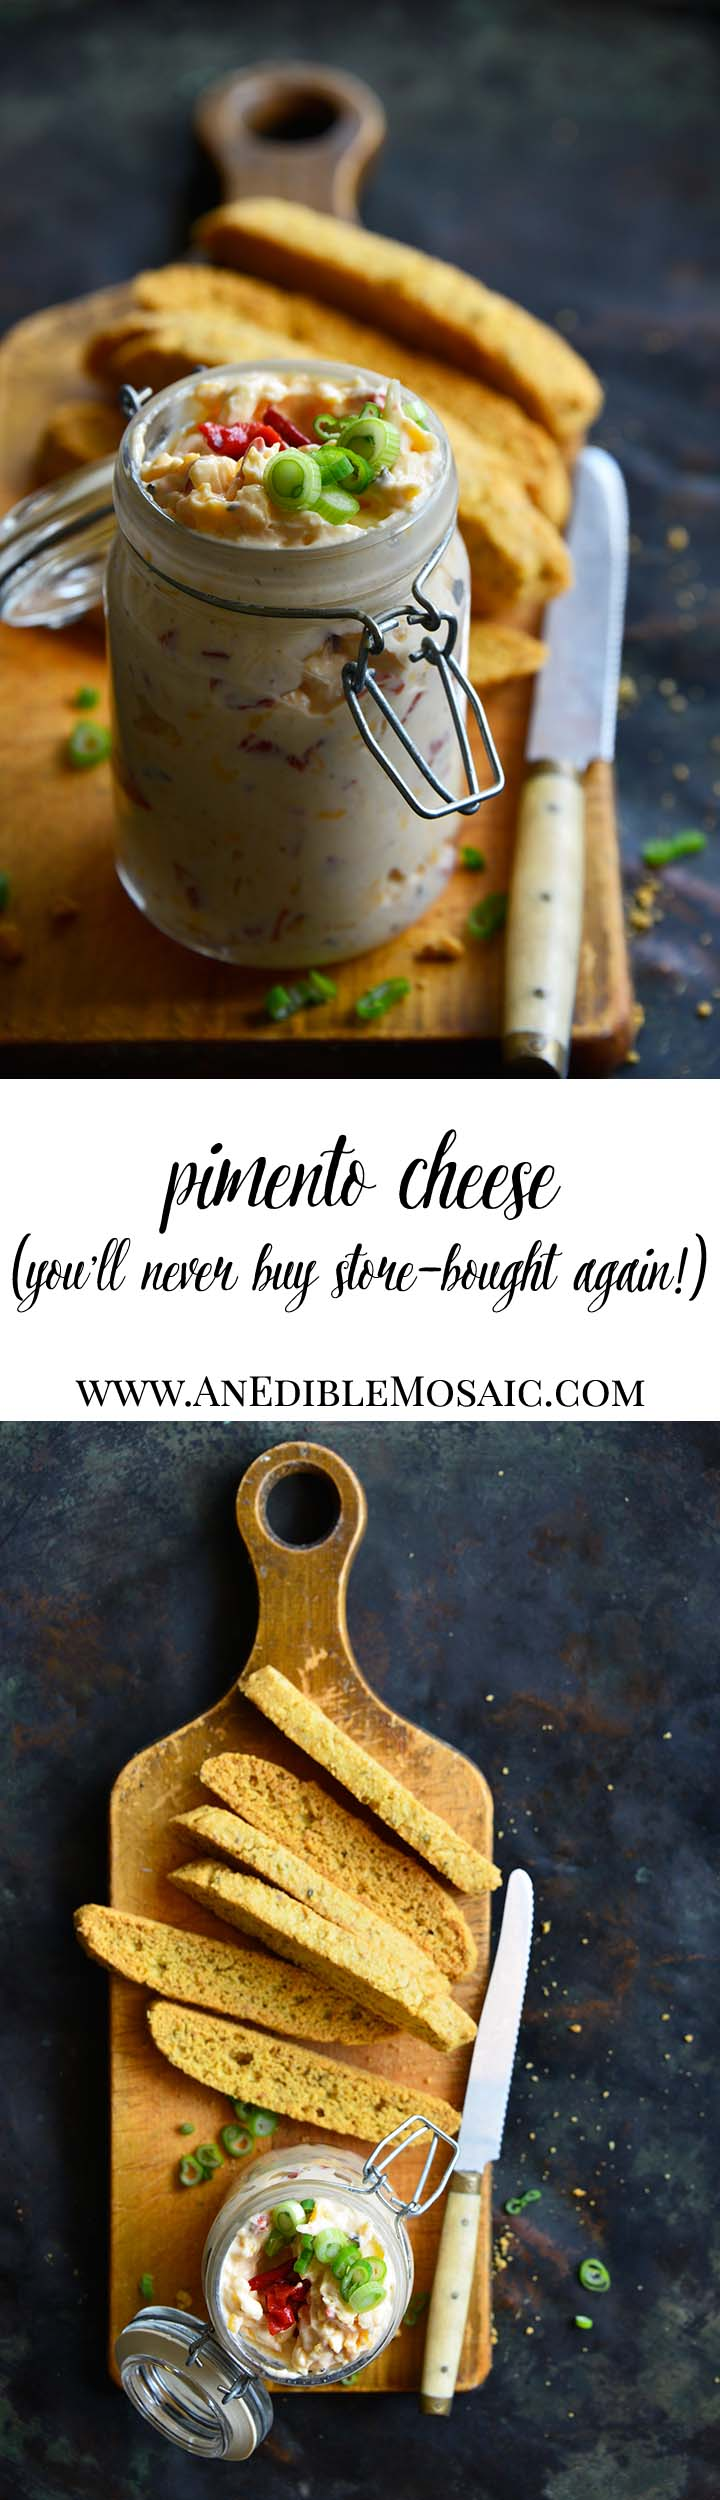 Pimento Cheese Long Pin